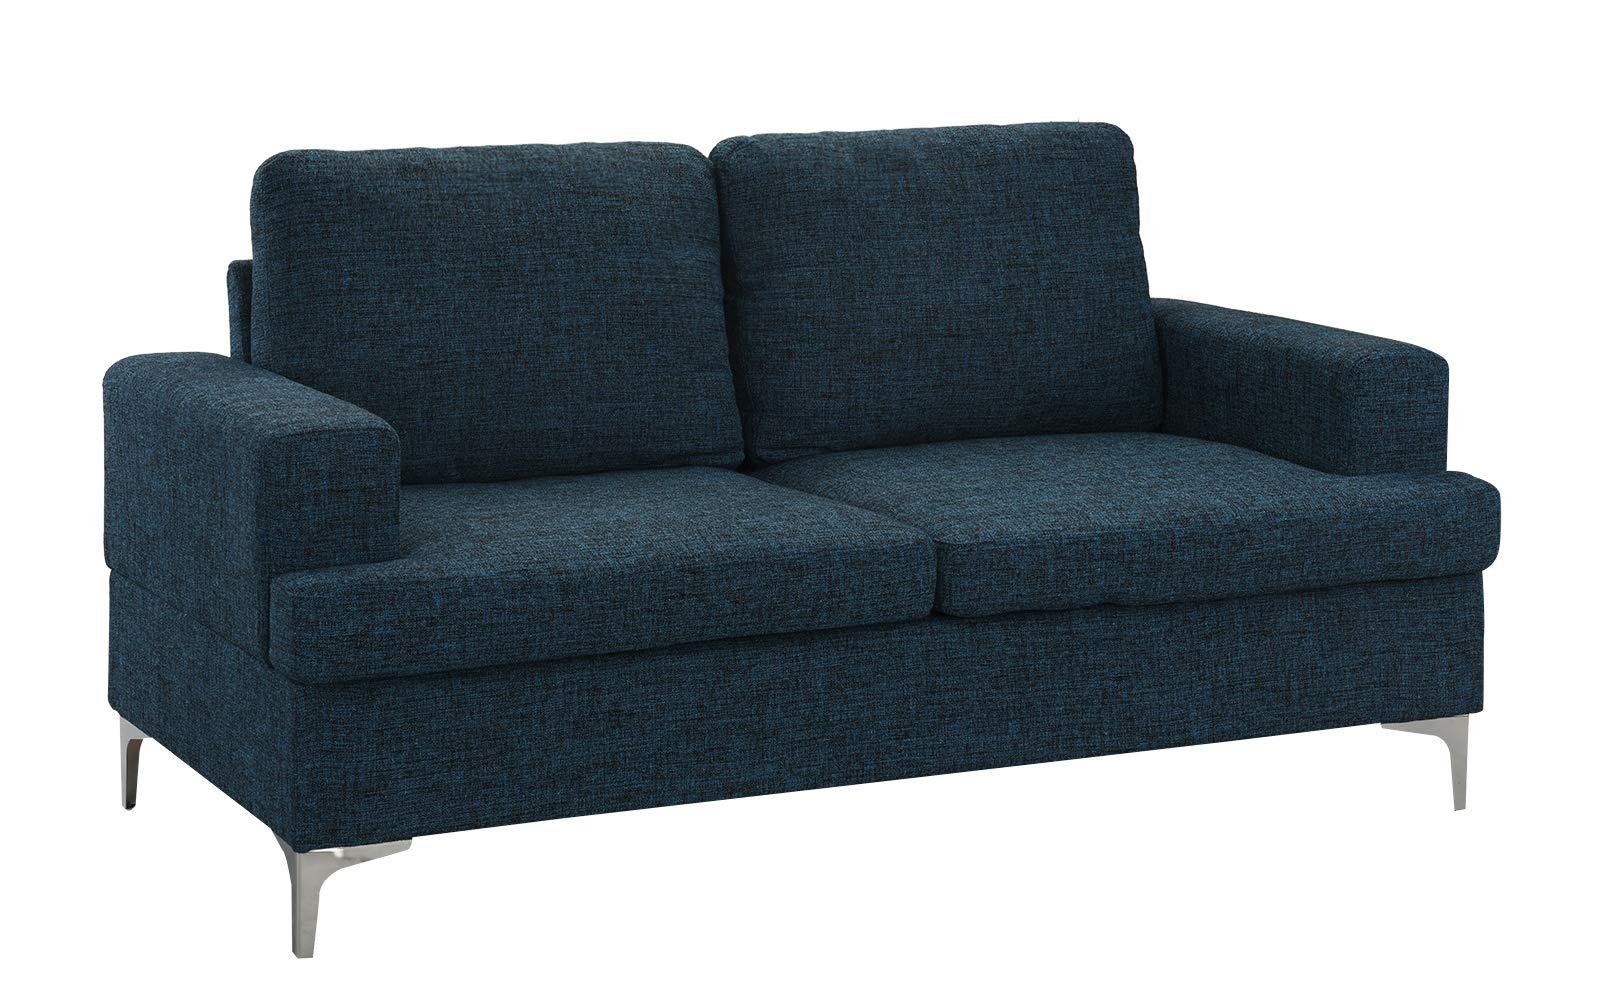 Mid Century Modern Linen Fabric Loveseat Couch (Dark Blue) by Casa Andrea Milano